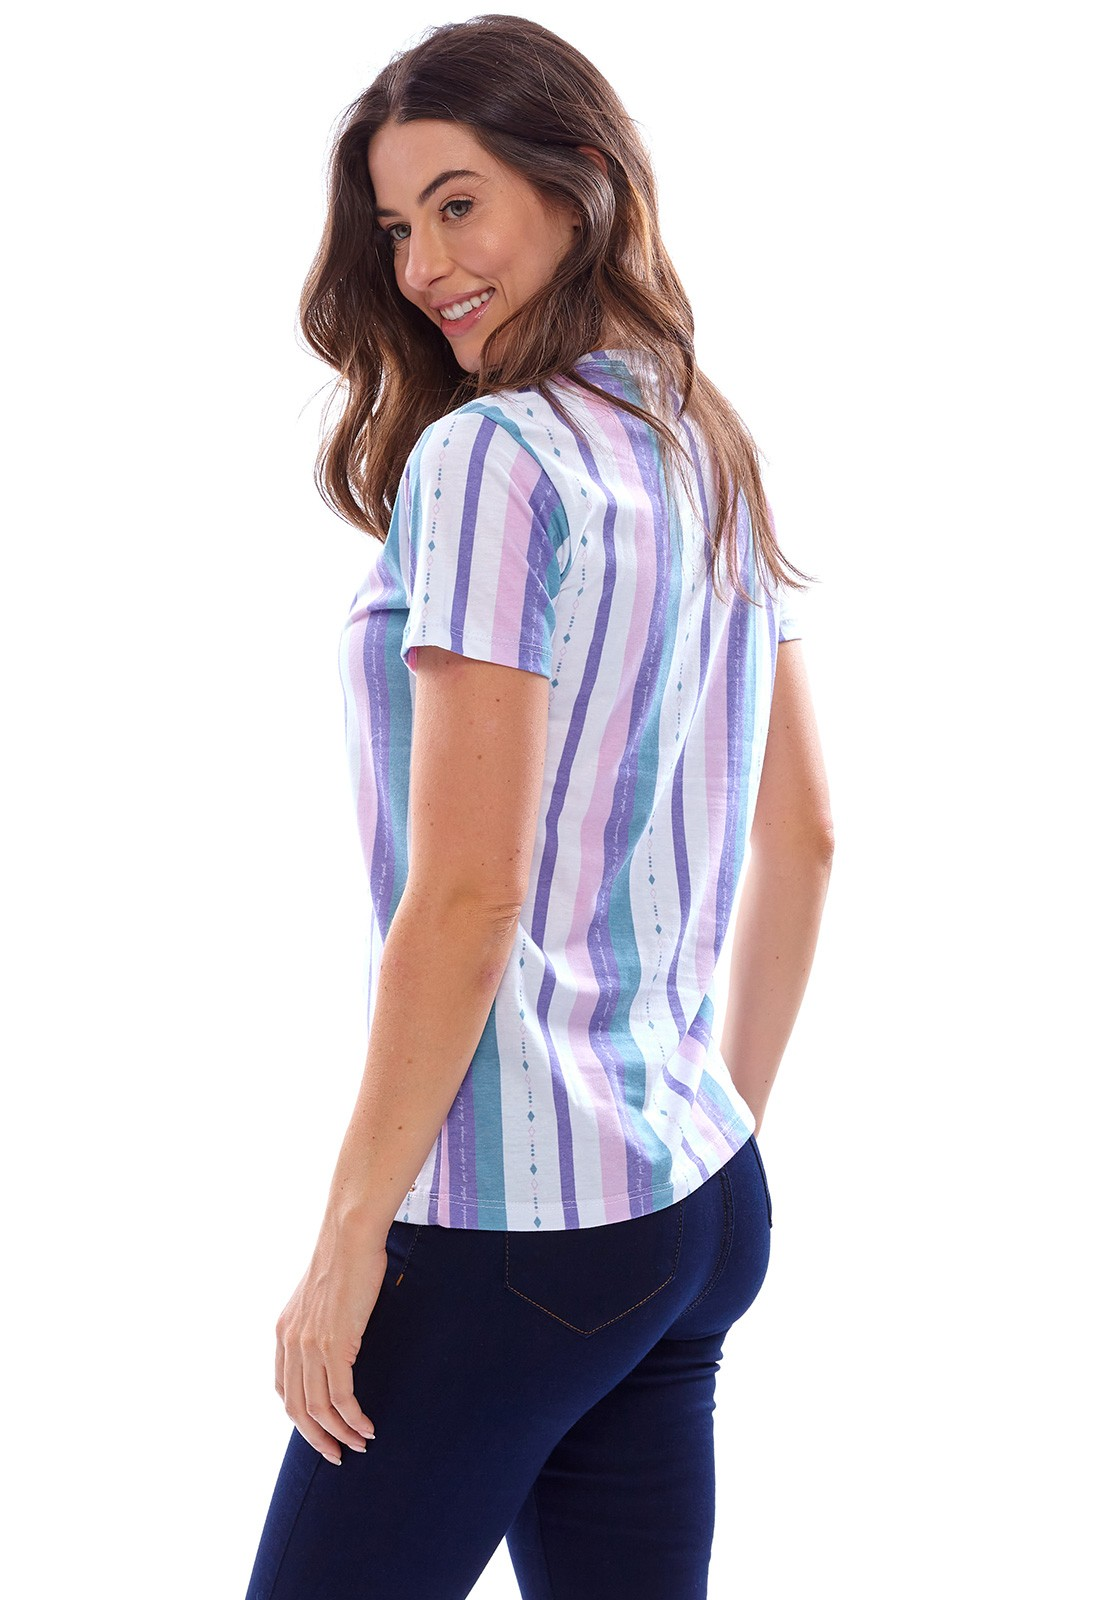 Camiseta Vida Marinha Manga Curta Branco/Color